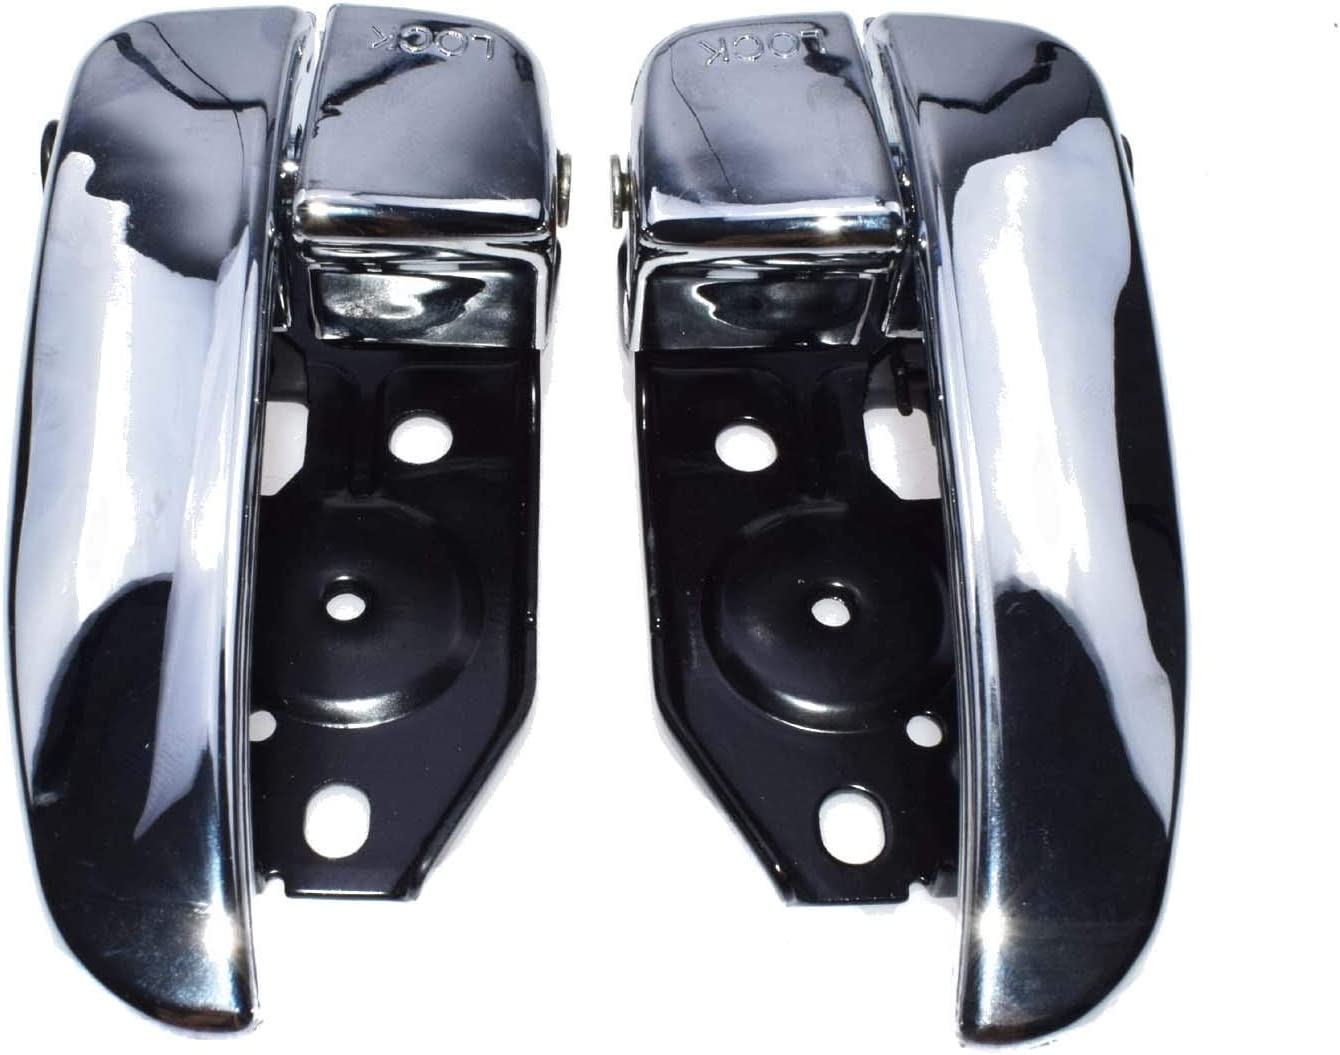 826103D010 T/ürgriff vorne oder hinten links rechts f/ür Sonata 826203D010 2 St/ück